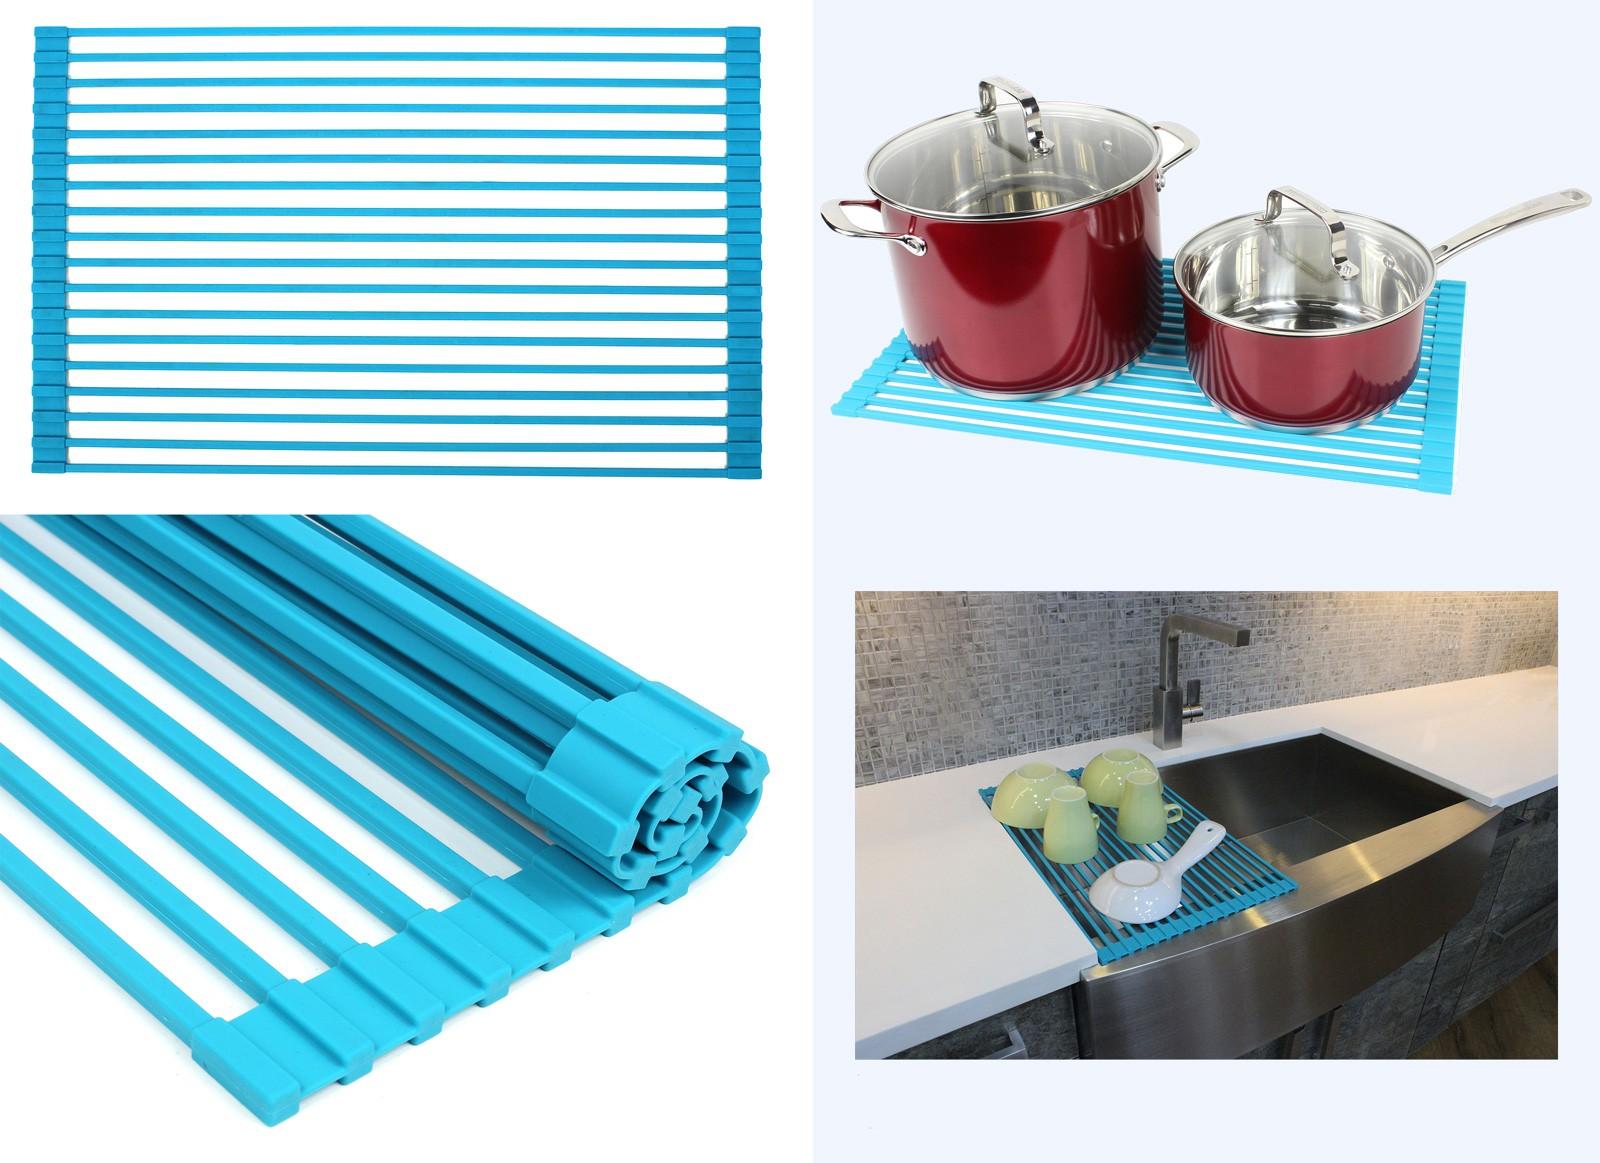 Silicone Dish Racks